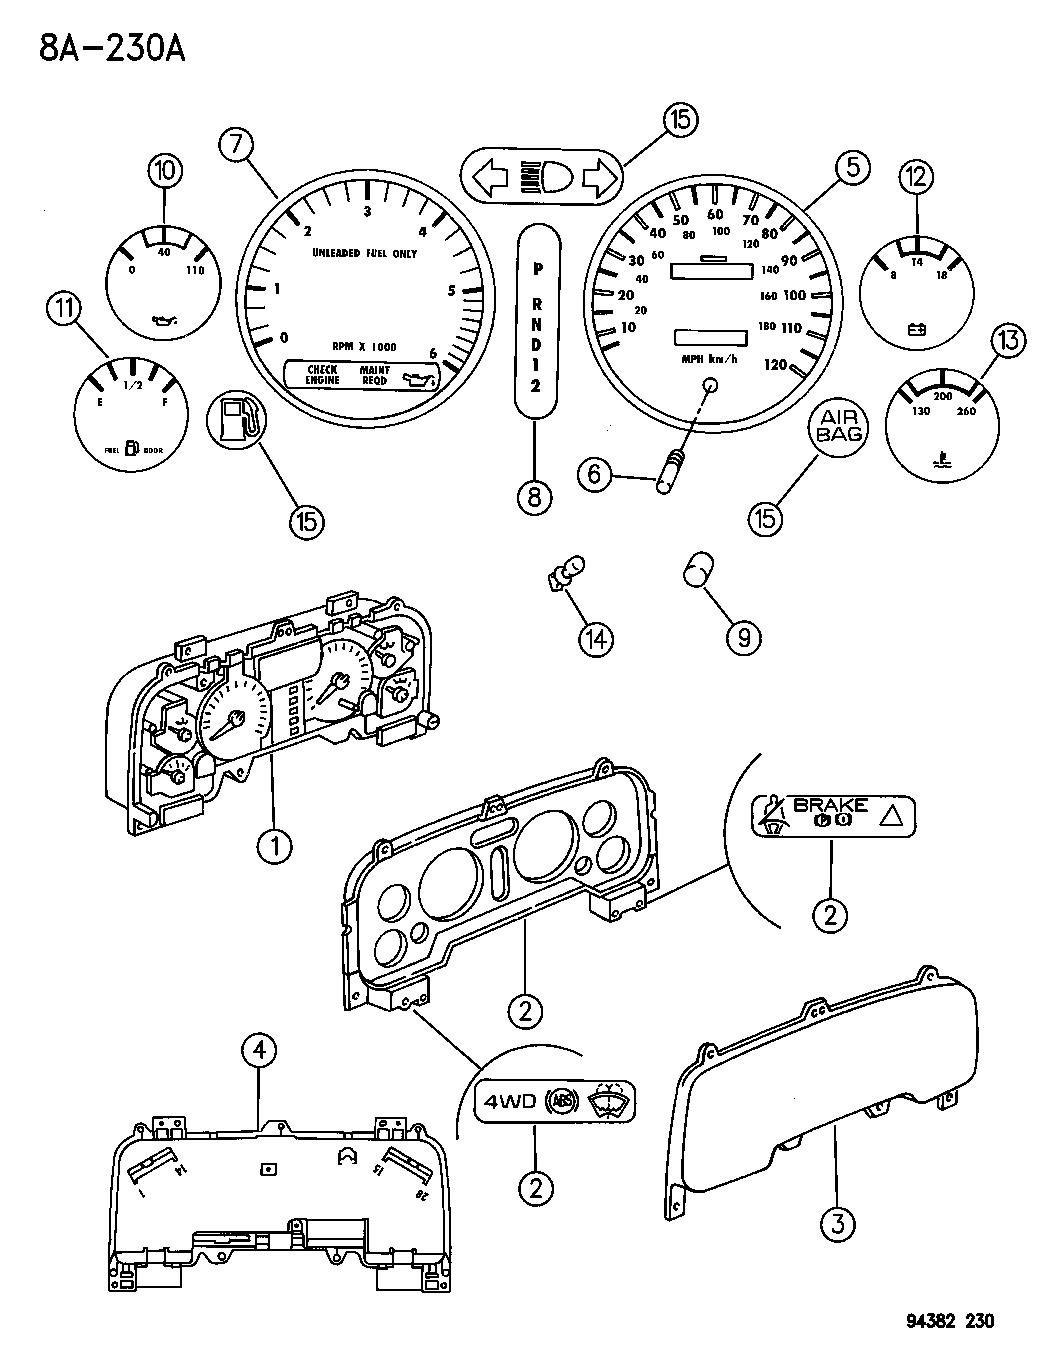 1994 dodge ram 2500 instrument panel cluster